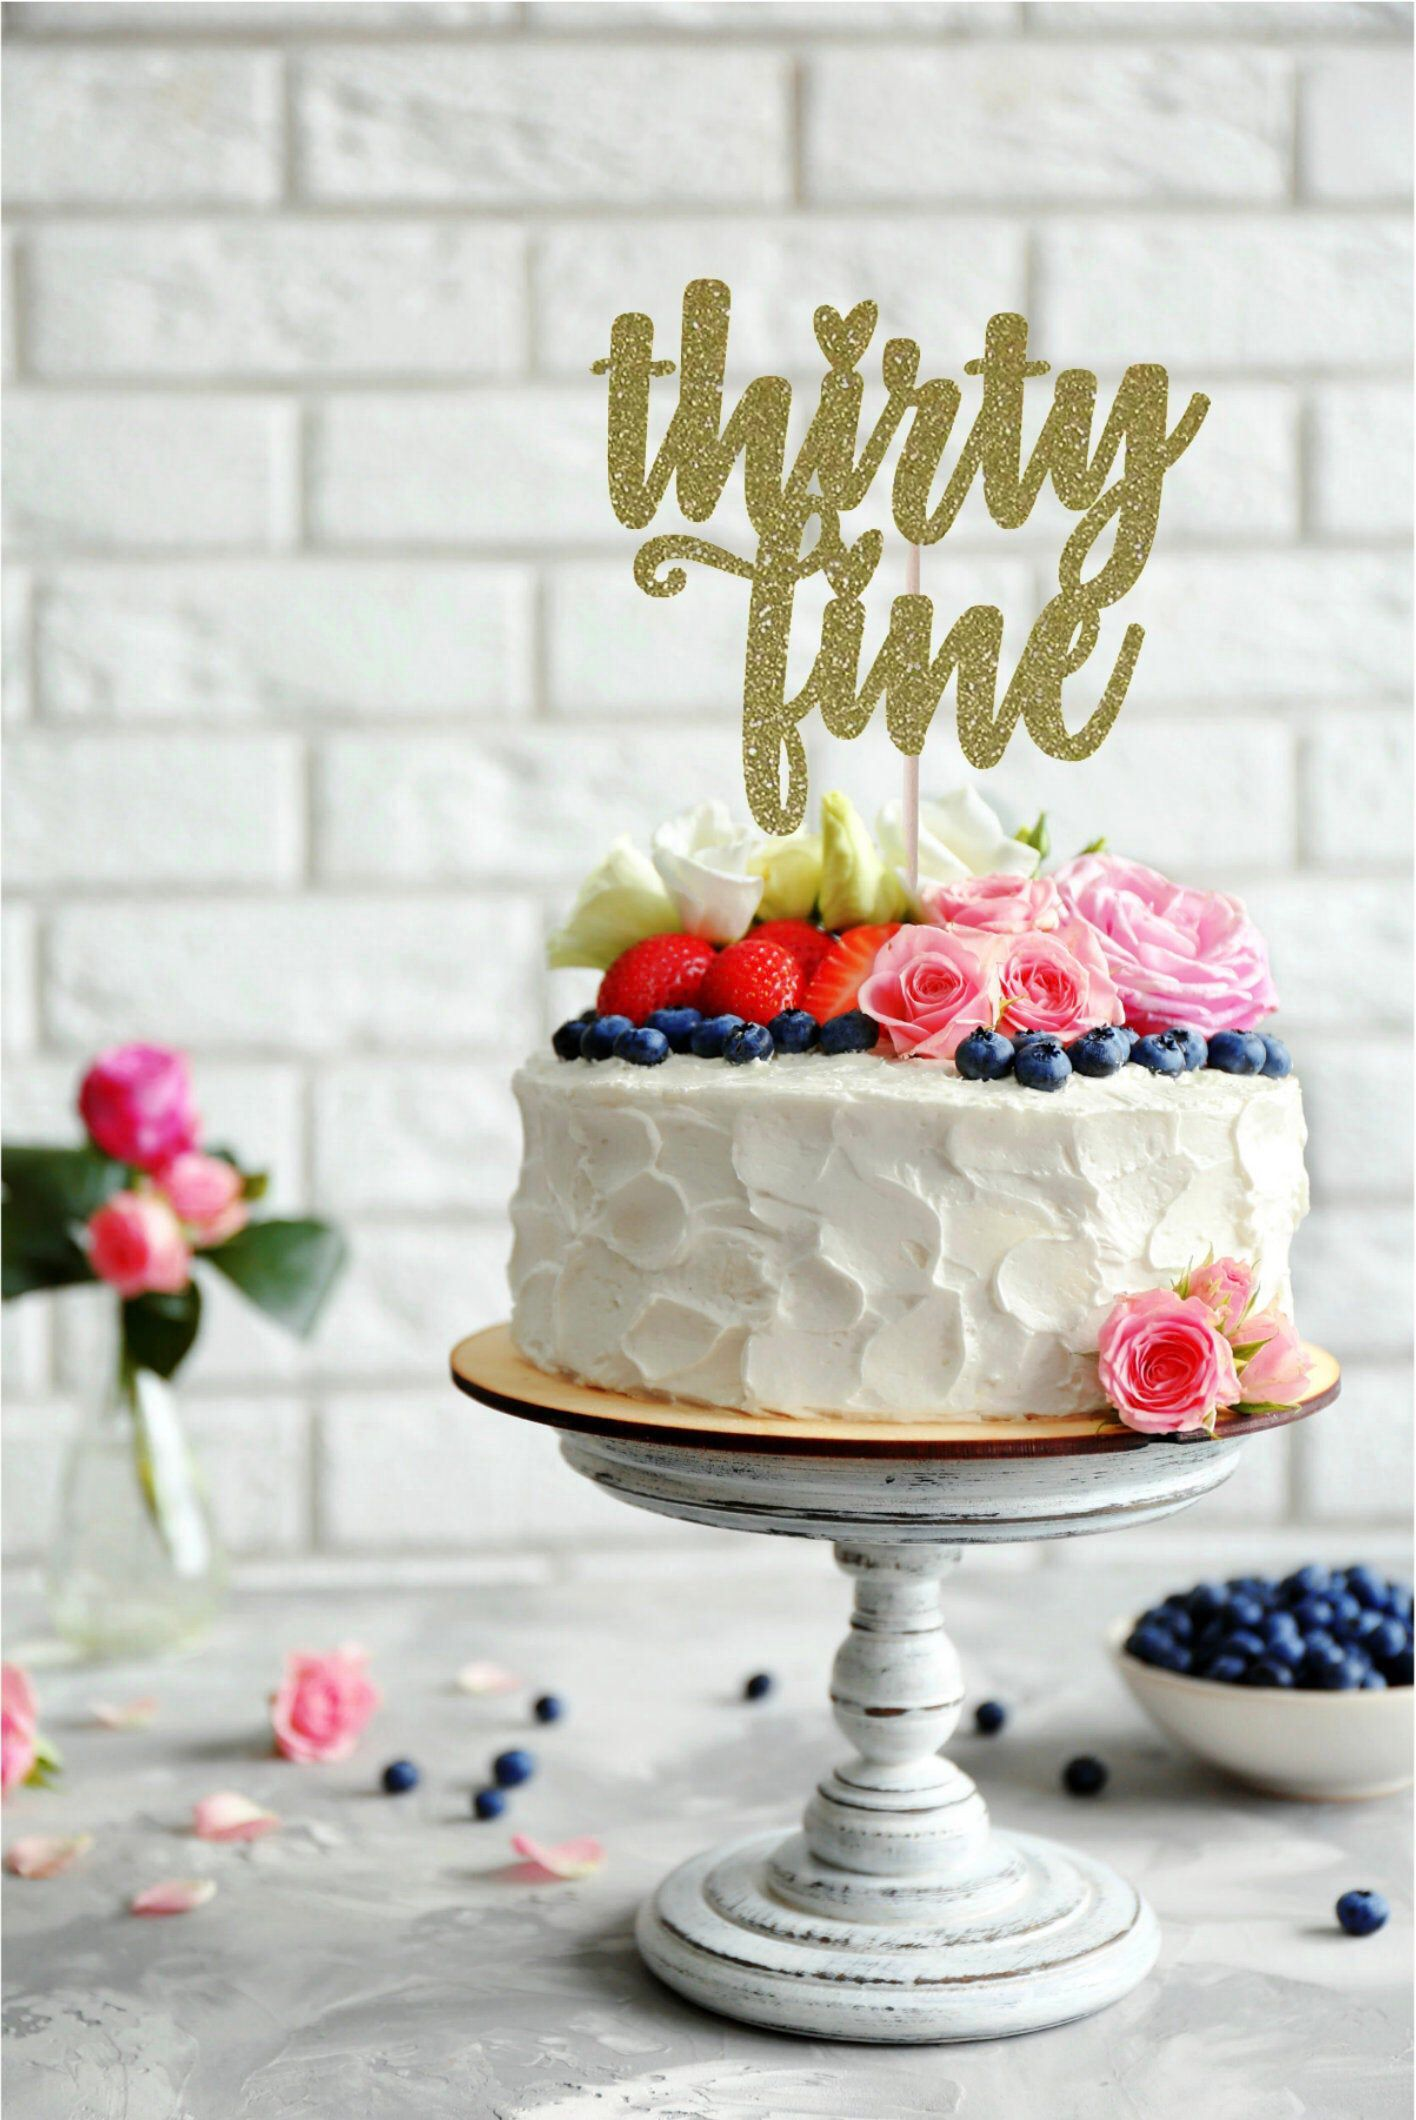 Thirty Fine Cake Topper Thirty Something Cake Topper Thirty Five Cake Topper Birthday Cake Topper 35th Cake Topper Milestone Birthday 30th Birthday Cake Topper Love Cake Topper Happy Birthday Cake Topper